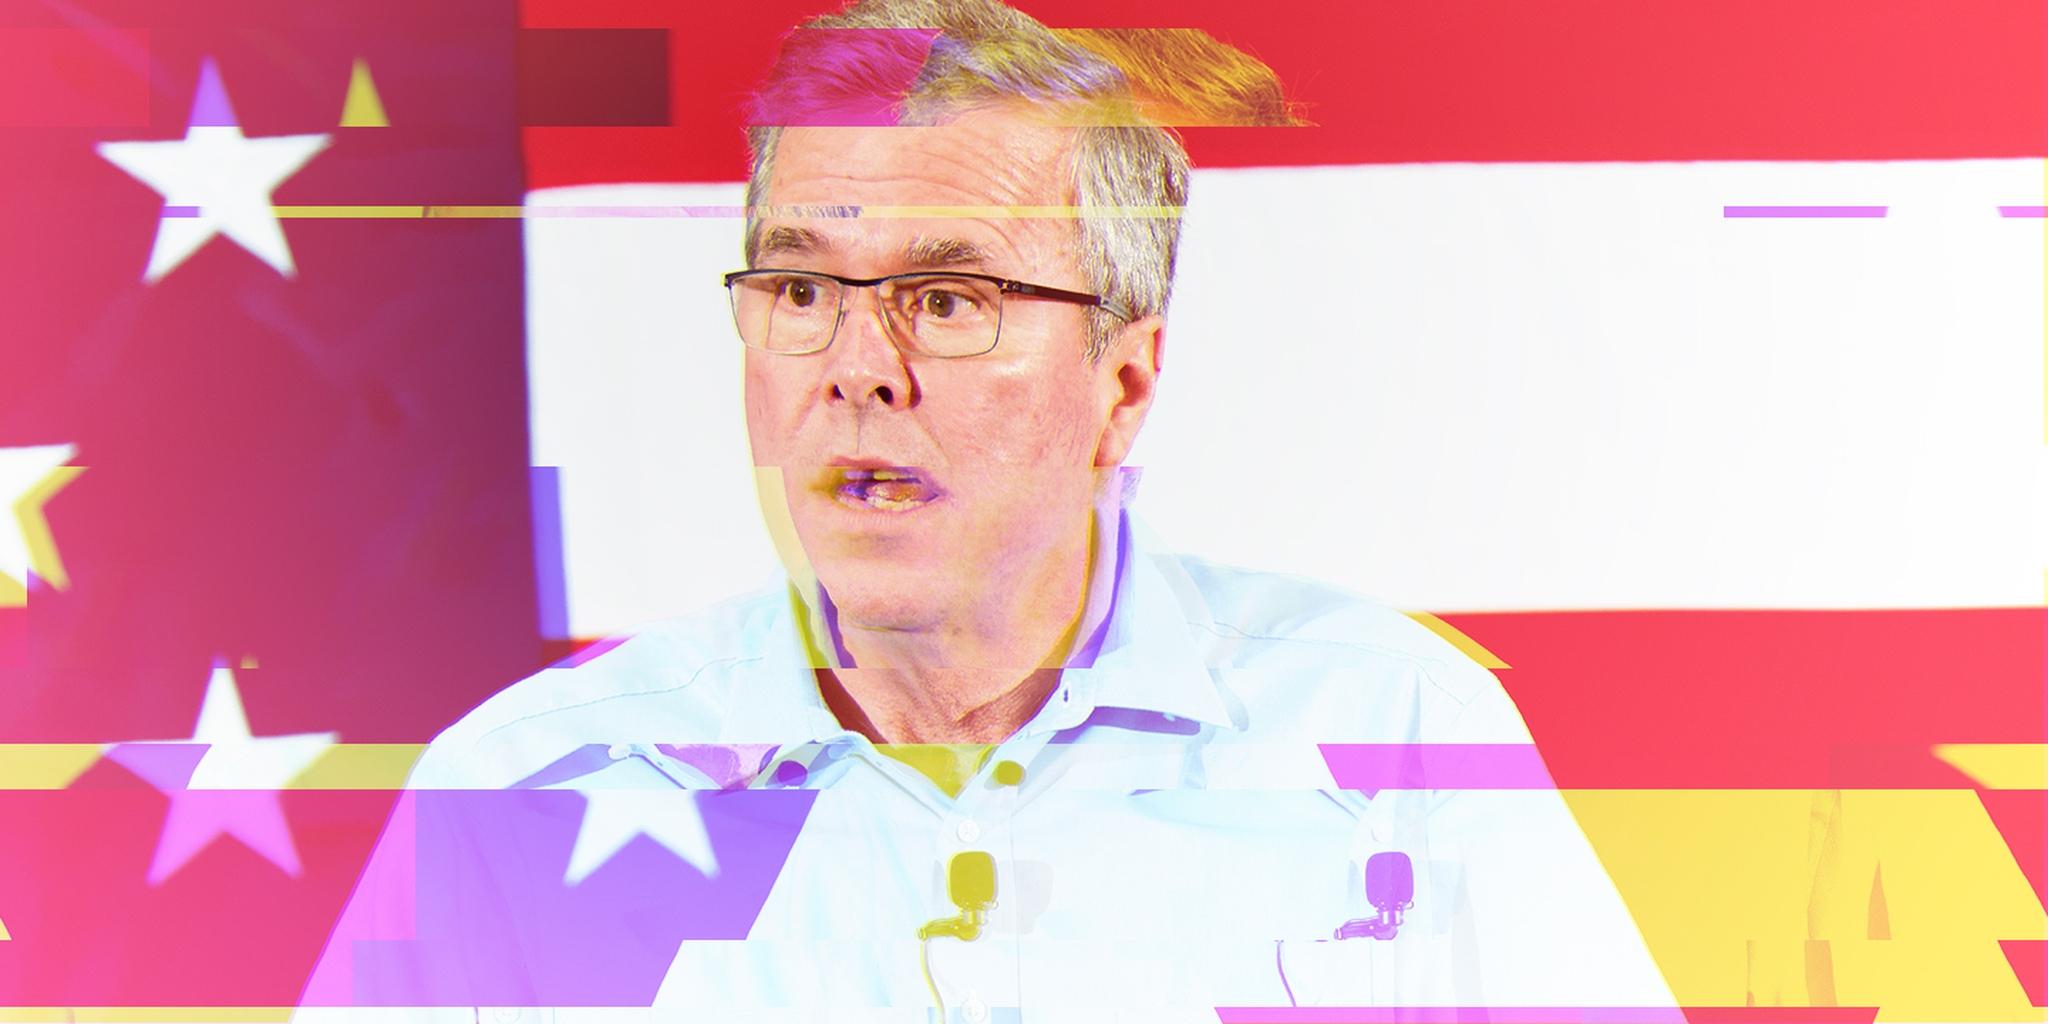 image of glitchy jeb bush